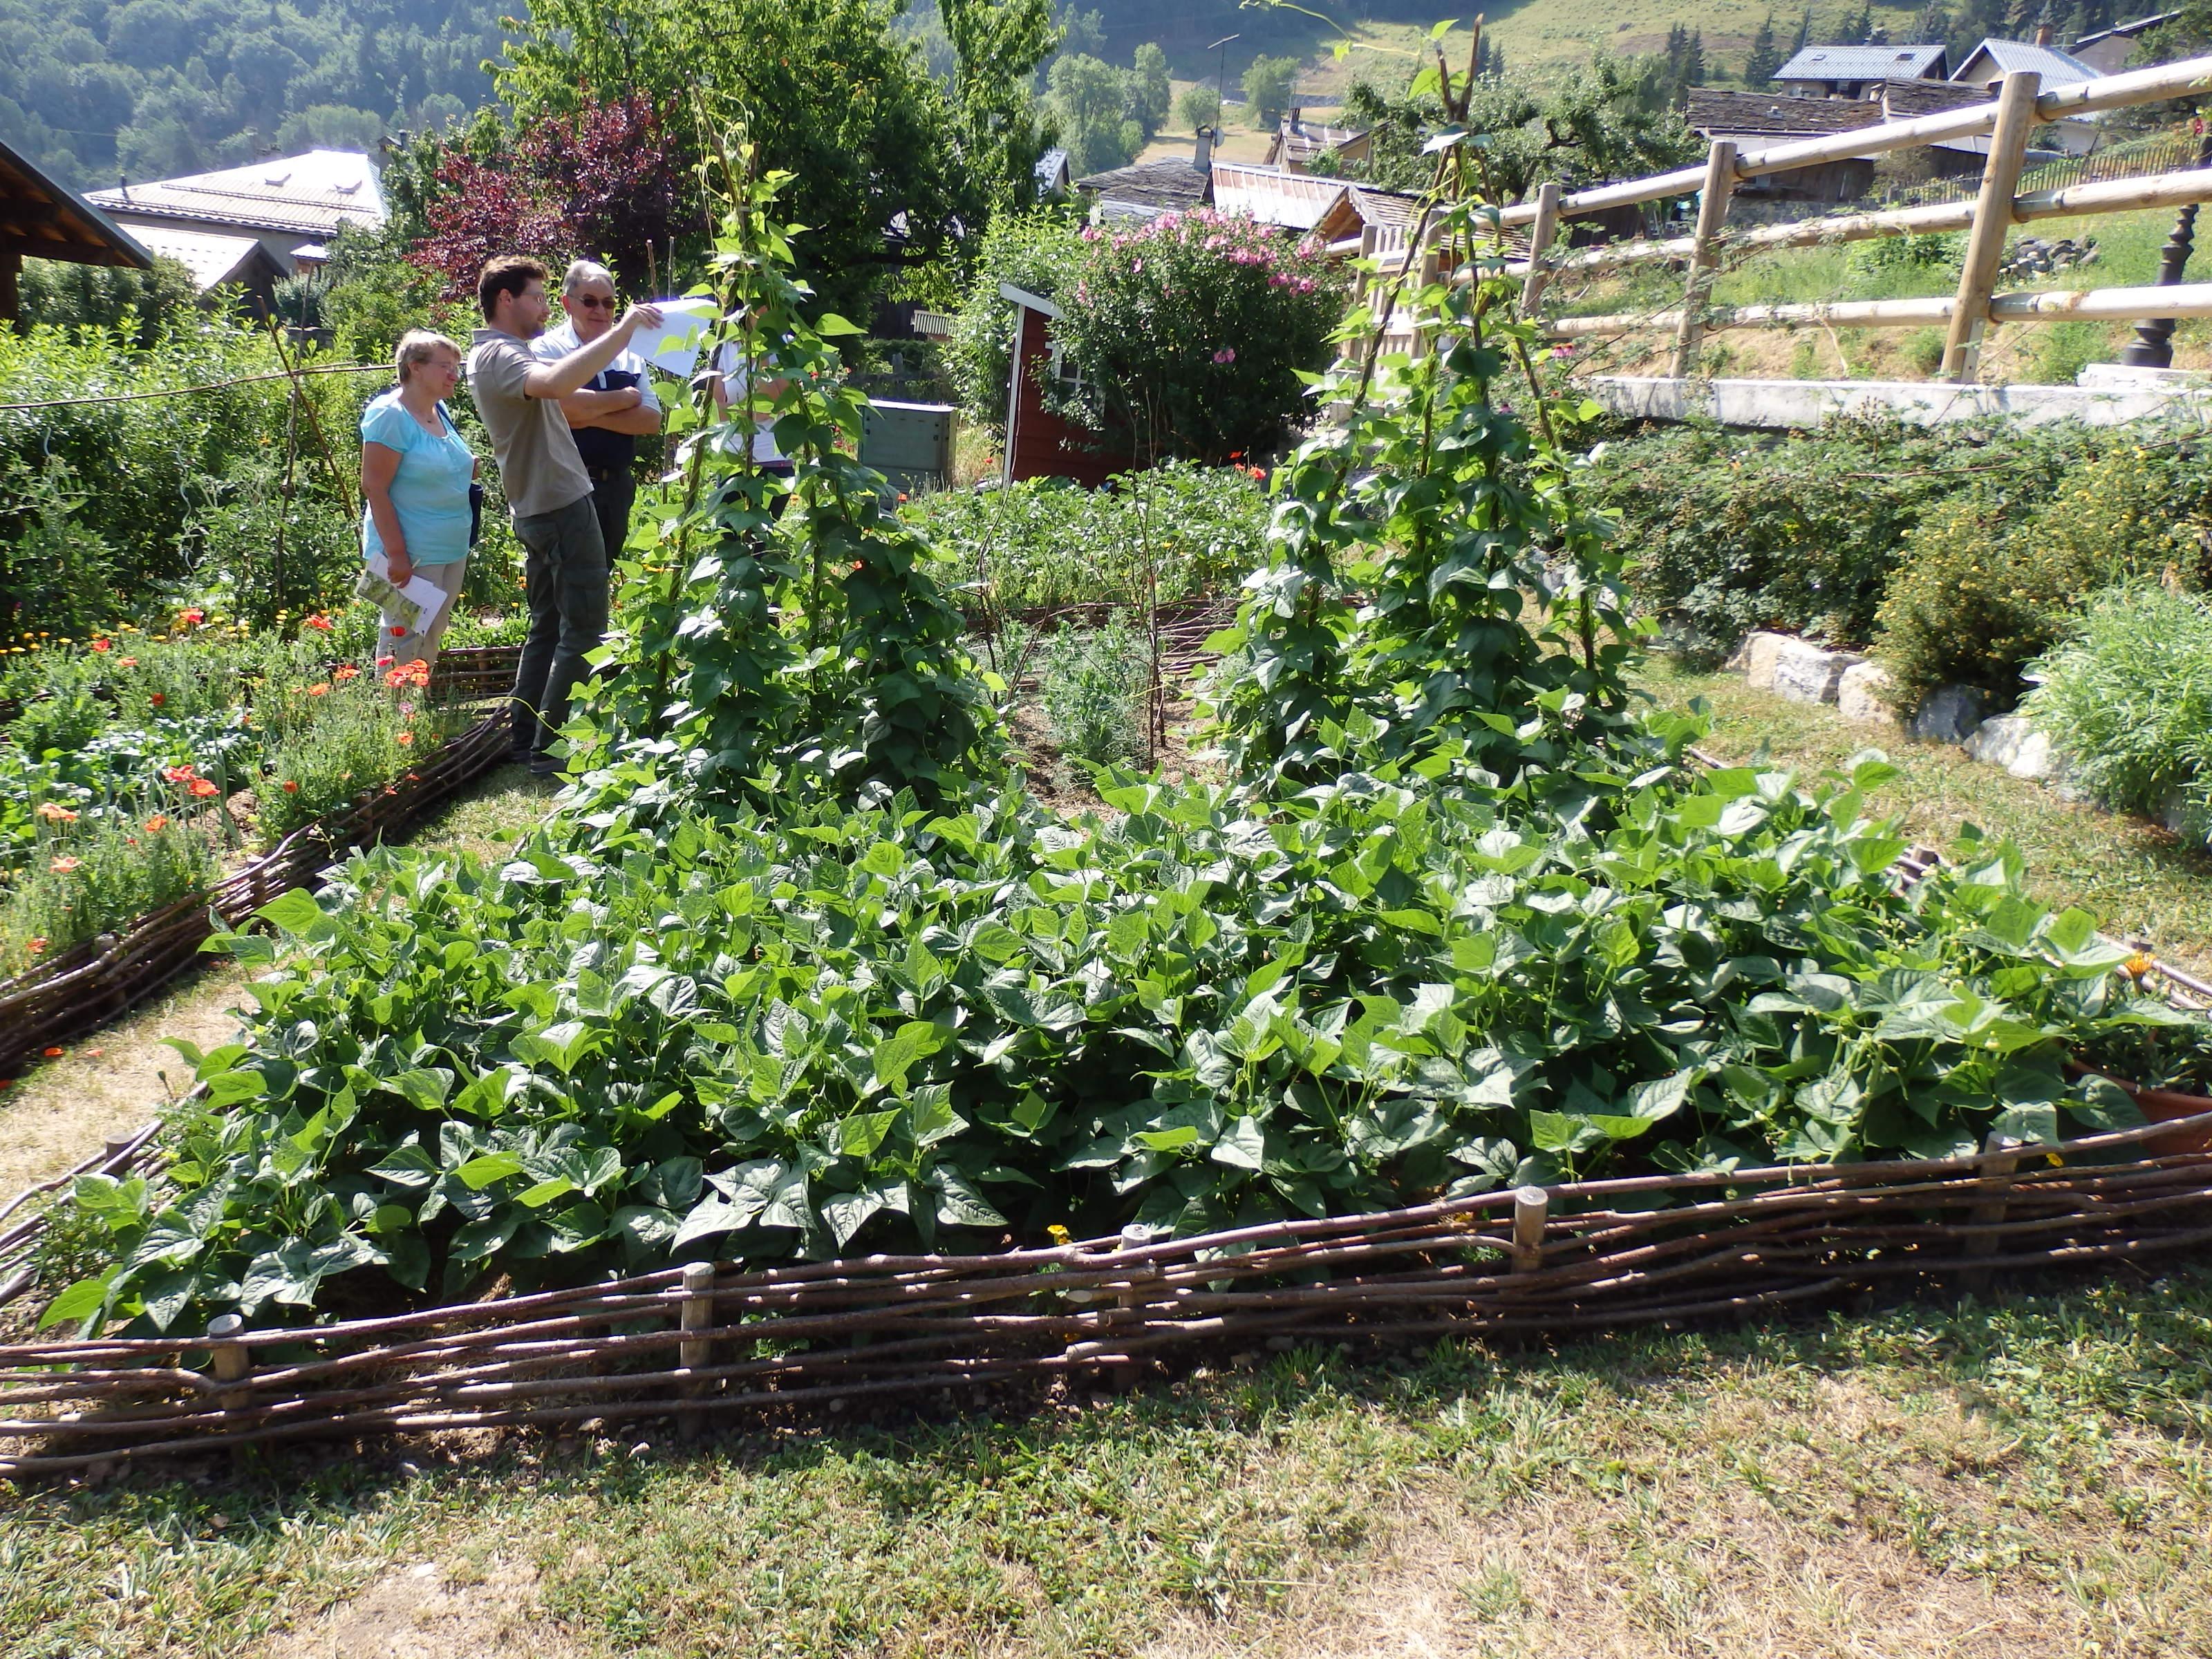 Jardin potager petit potager en carr agrandir luimage for Conseil plantation jardin